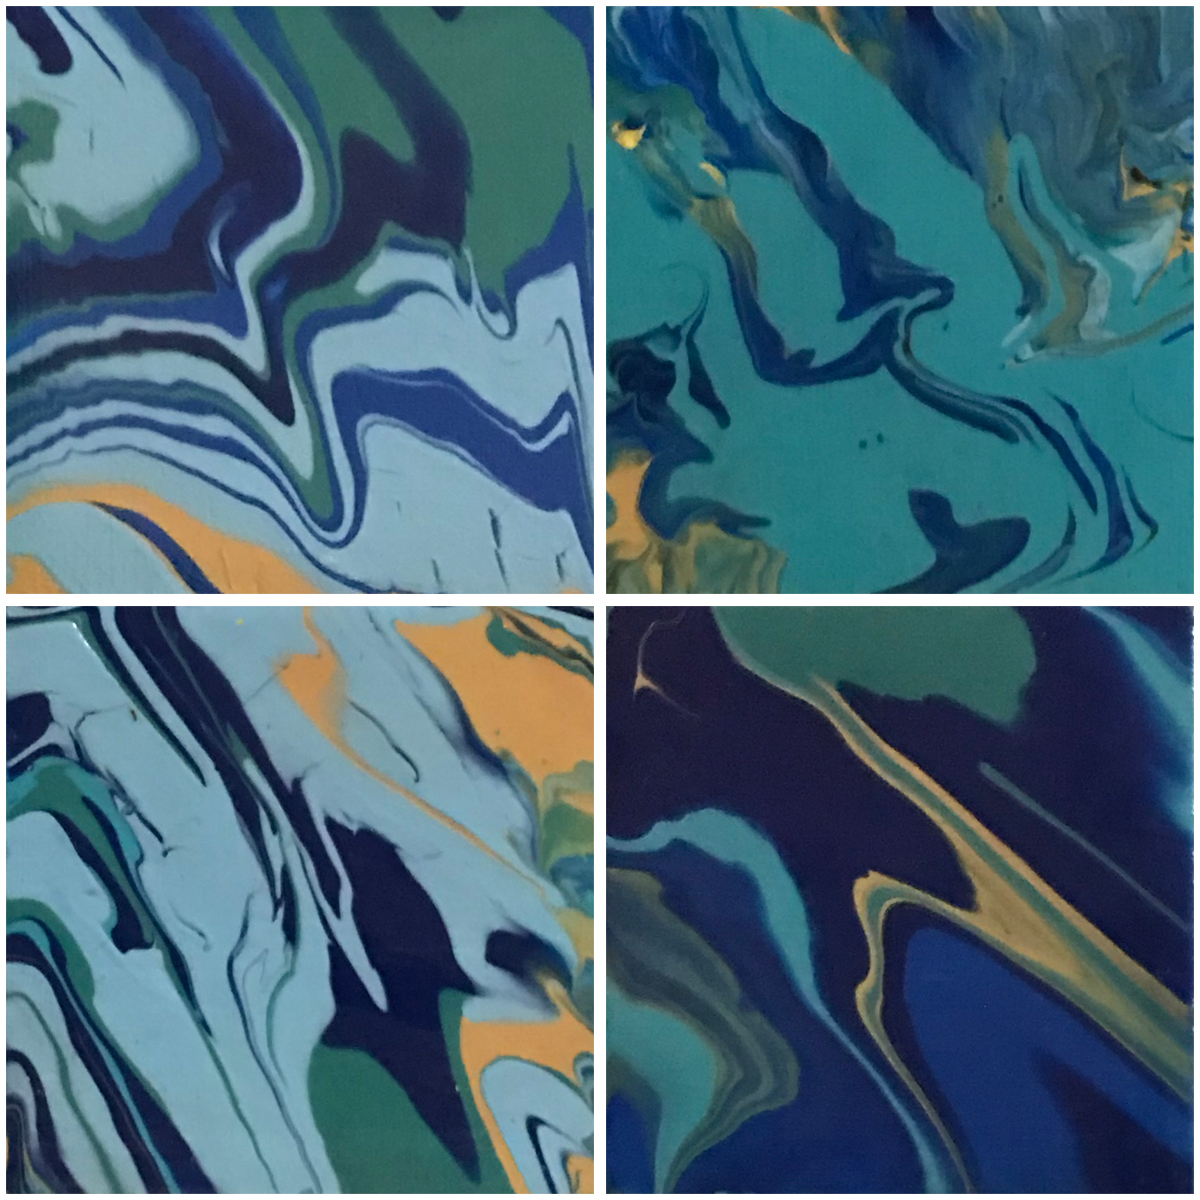 _ YaniPaints - Ocean Heart - acrylic on canvas - 4 4x4 Canvas panels - 2018 - $150.jpg